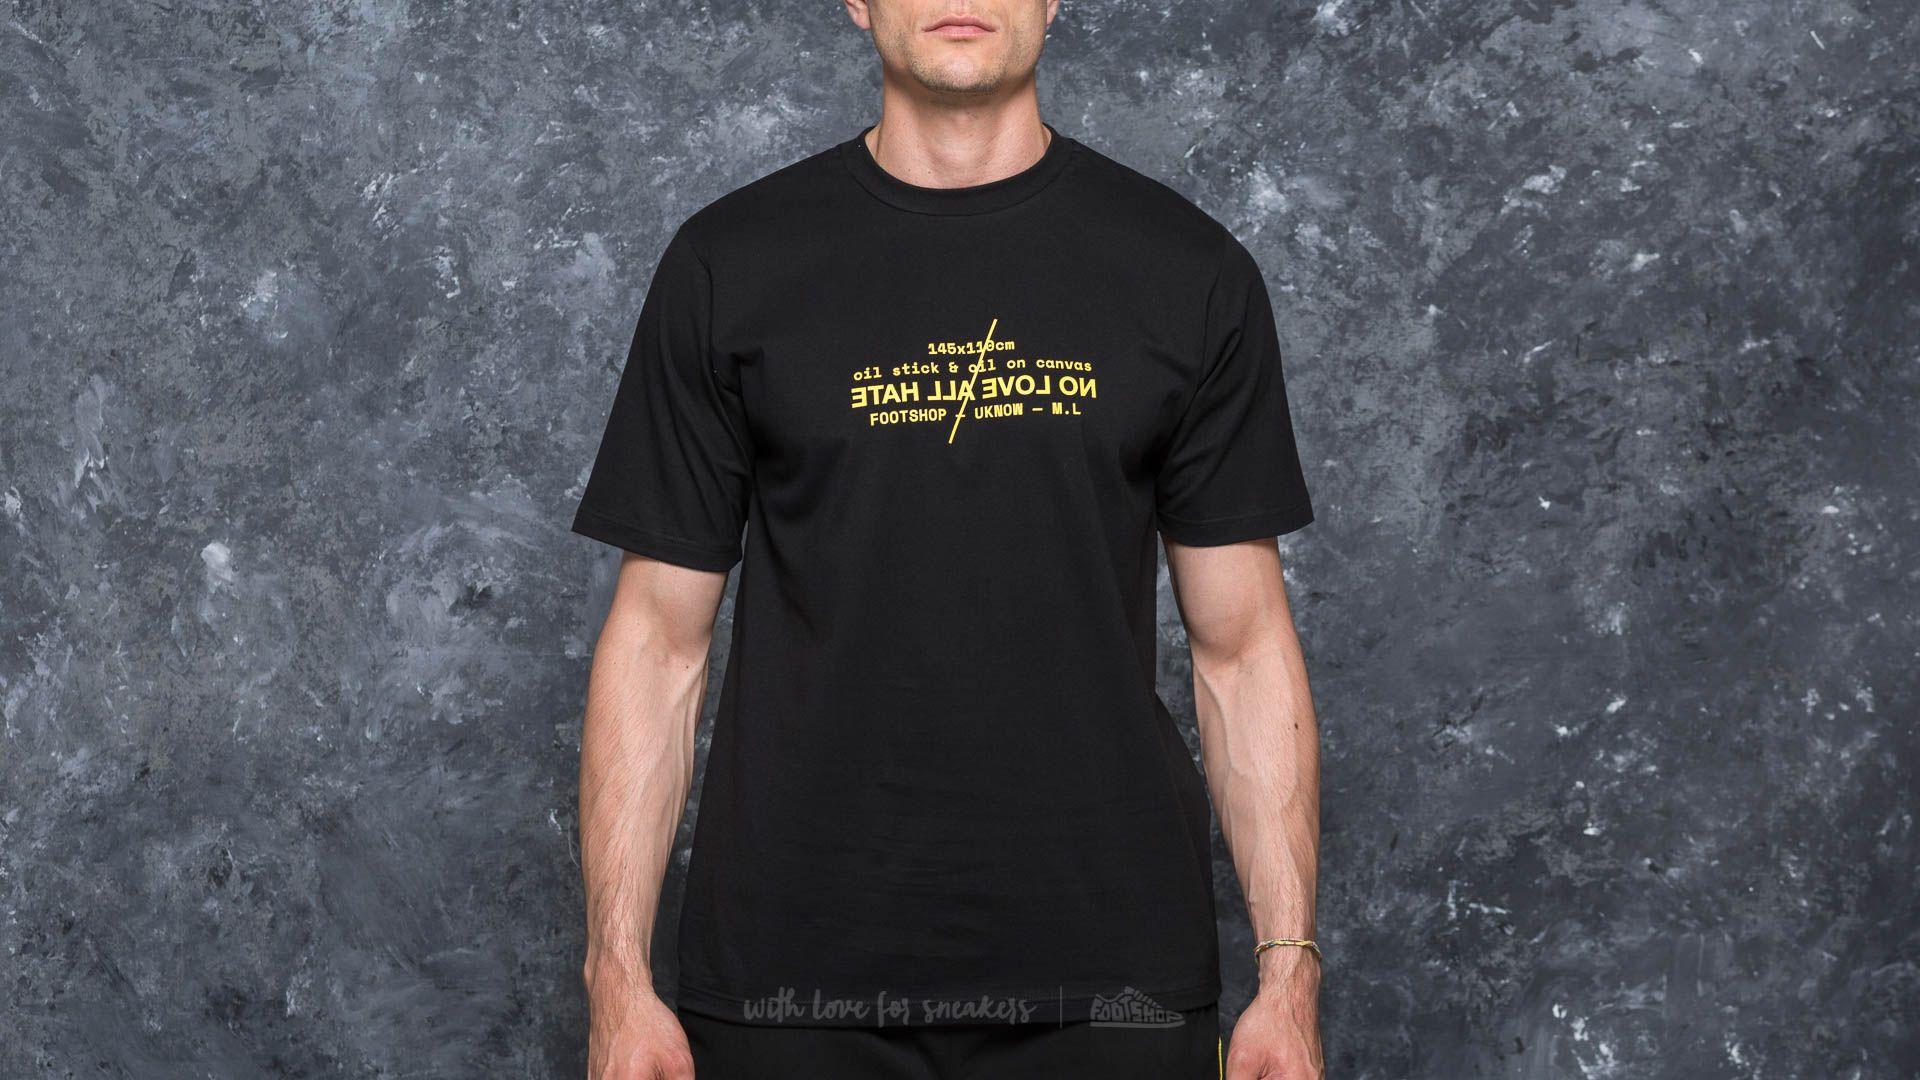 Footshop x UKNOW x M.L T-Shirt